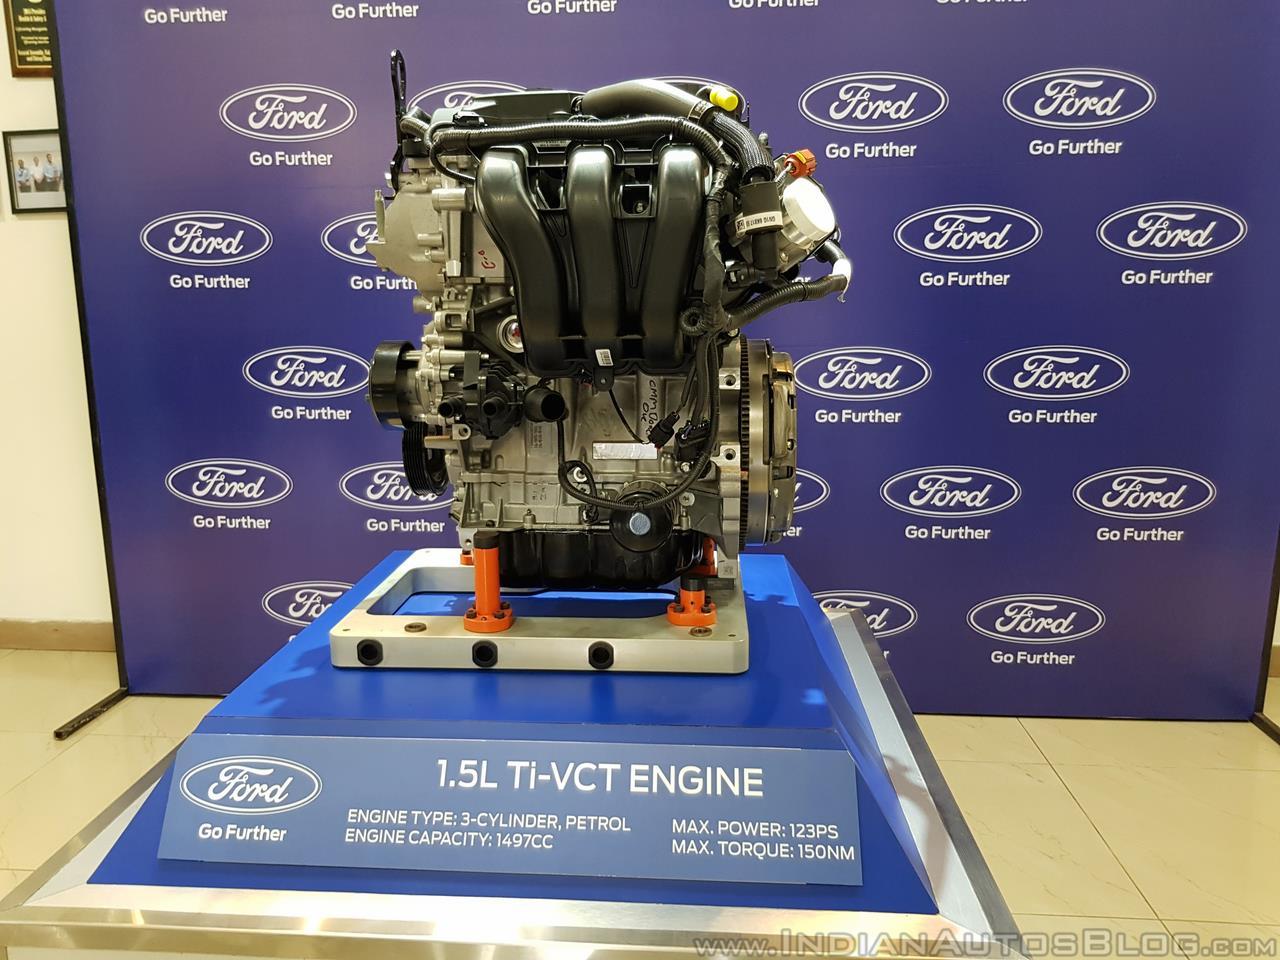 Dragon 1.5-litre Ti-VCT engine